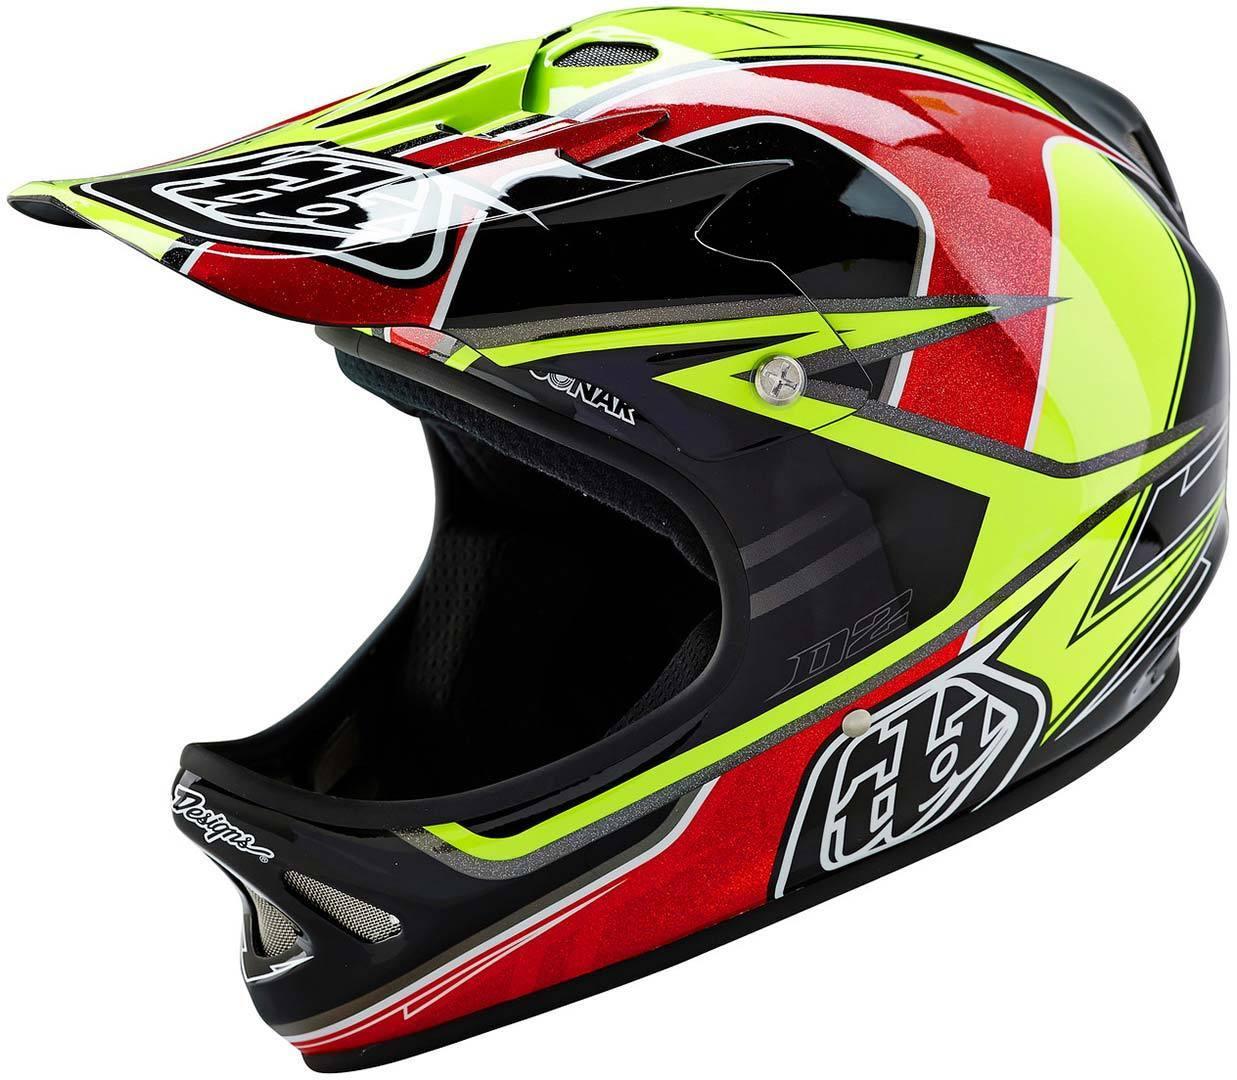 Lee D2 Sonar Downhill Helmet Casco in discesa